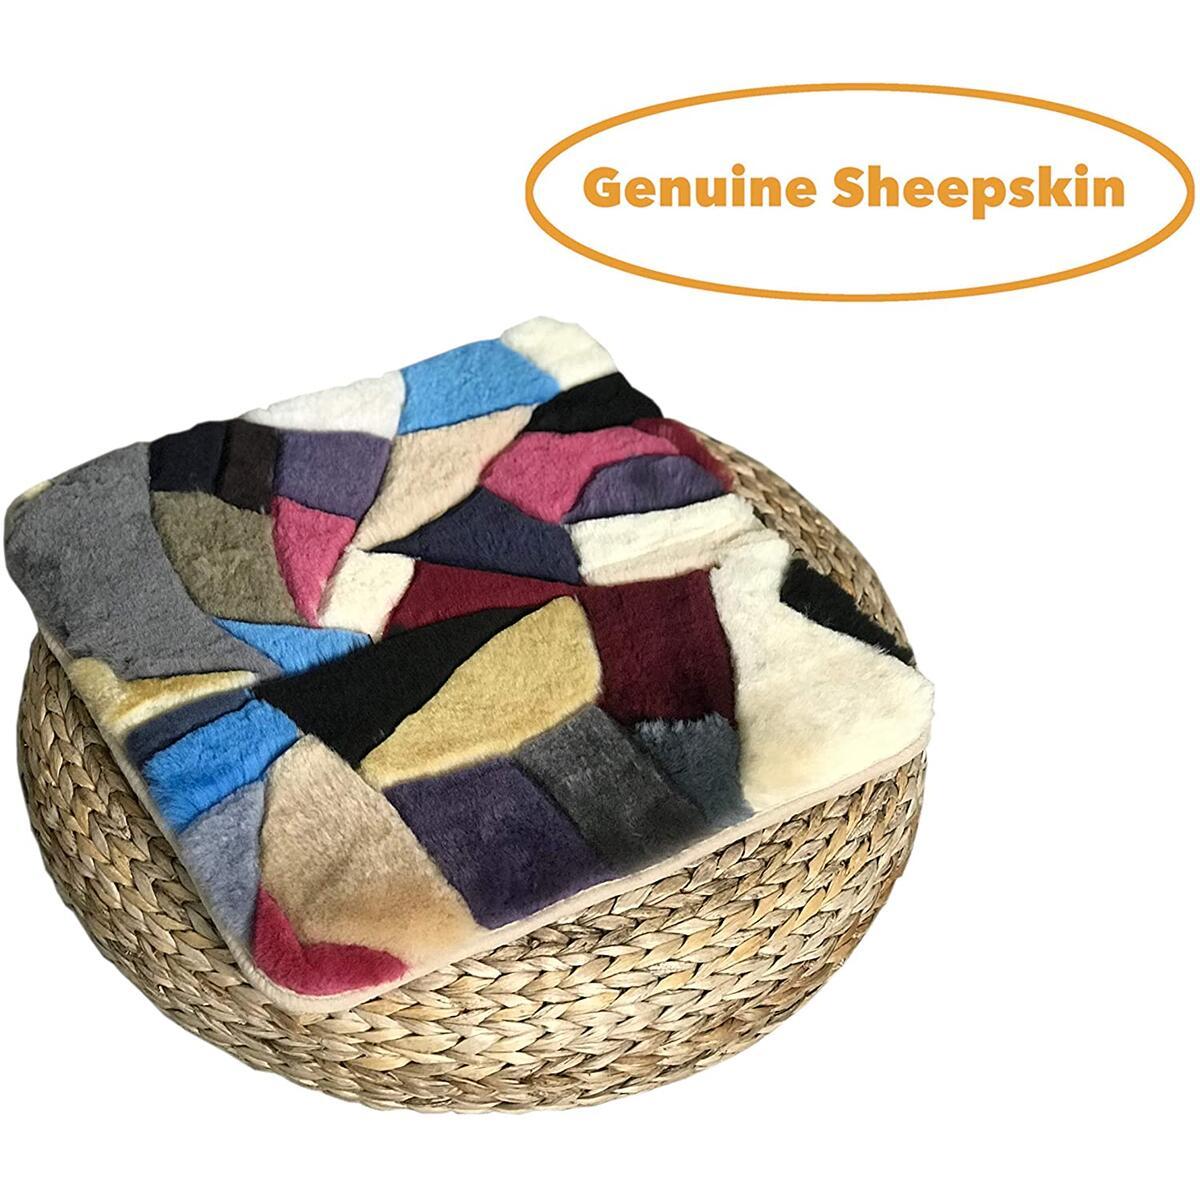 Genuine Australian Sheepskin Seat Pad, Thick Short Wool Sheepskin Car Seat Cover, Universal Fit Auto Seat Pad, Fuzzy Car Seat Cover, Fluffy Wool Seat Cushion, Soft Warm Winter Sheepskin Seat Cushion